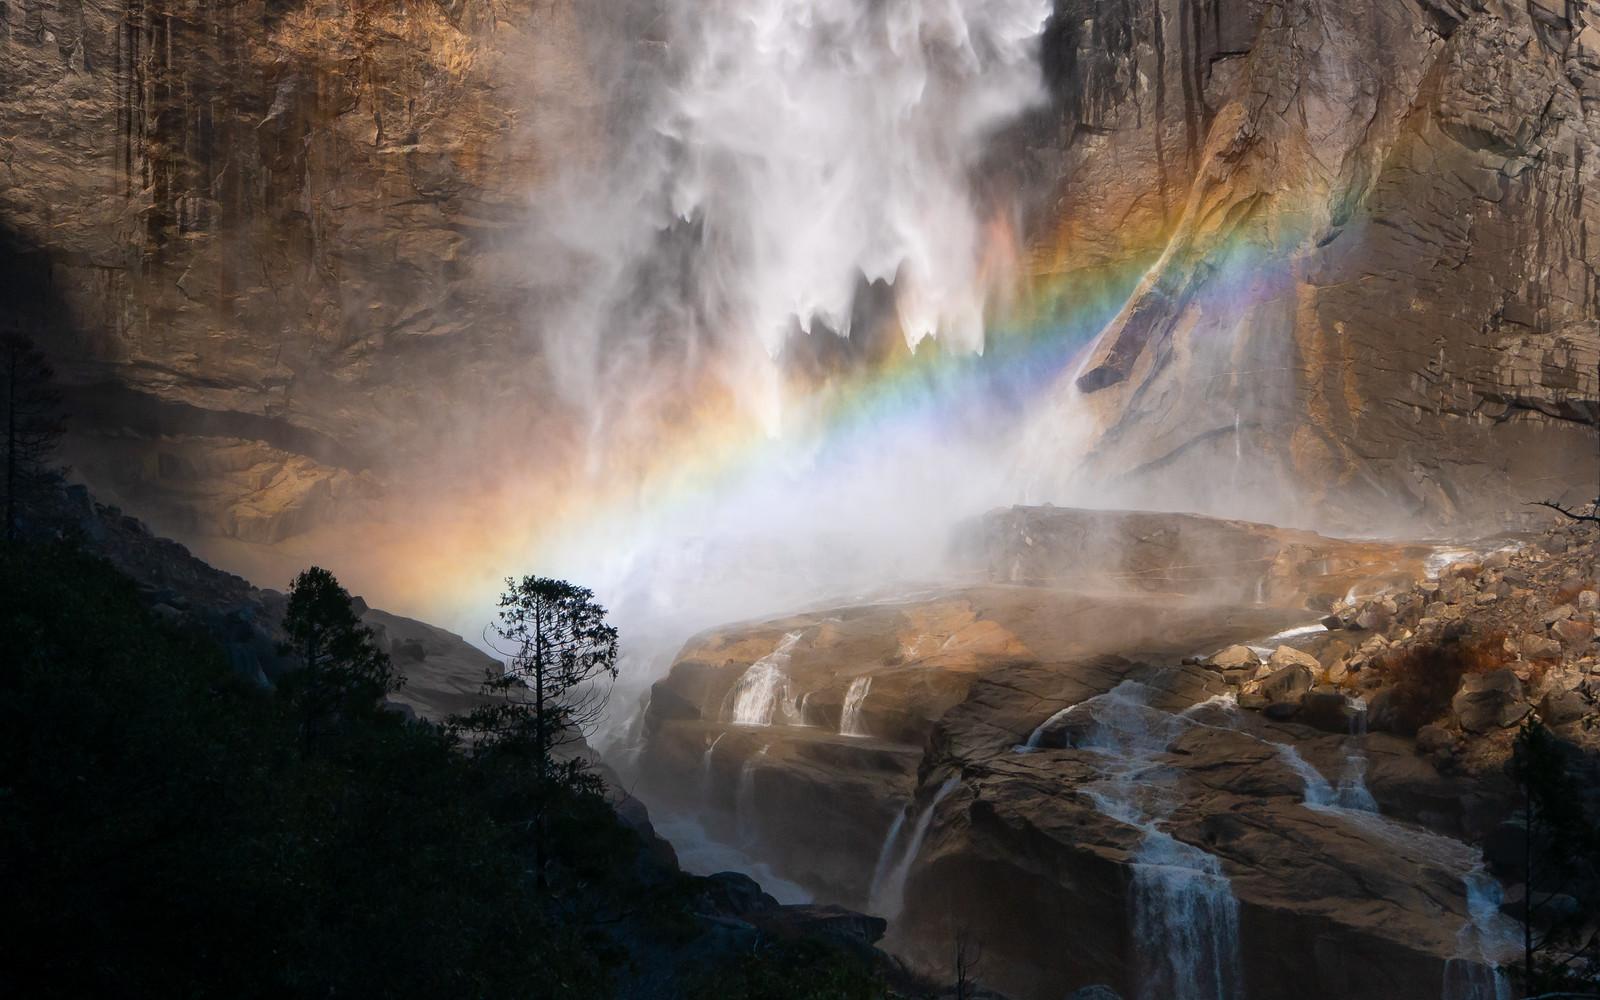 Upper Yosemite Falls, Yosemite National Park, California, February 18, 2015